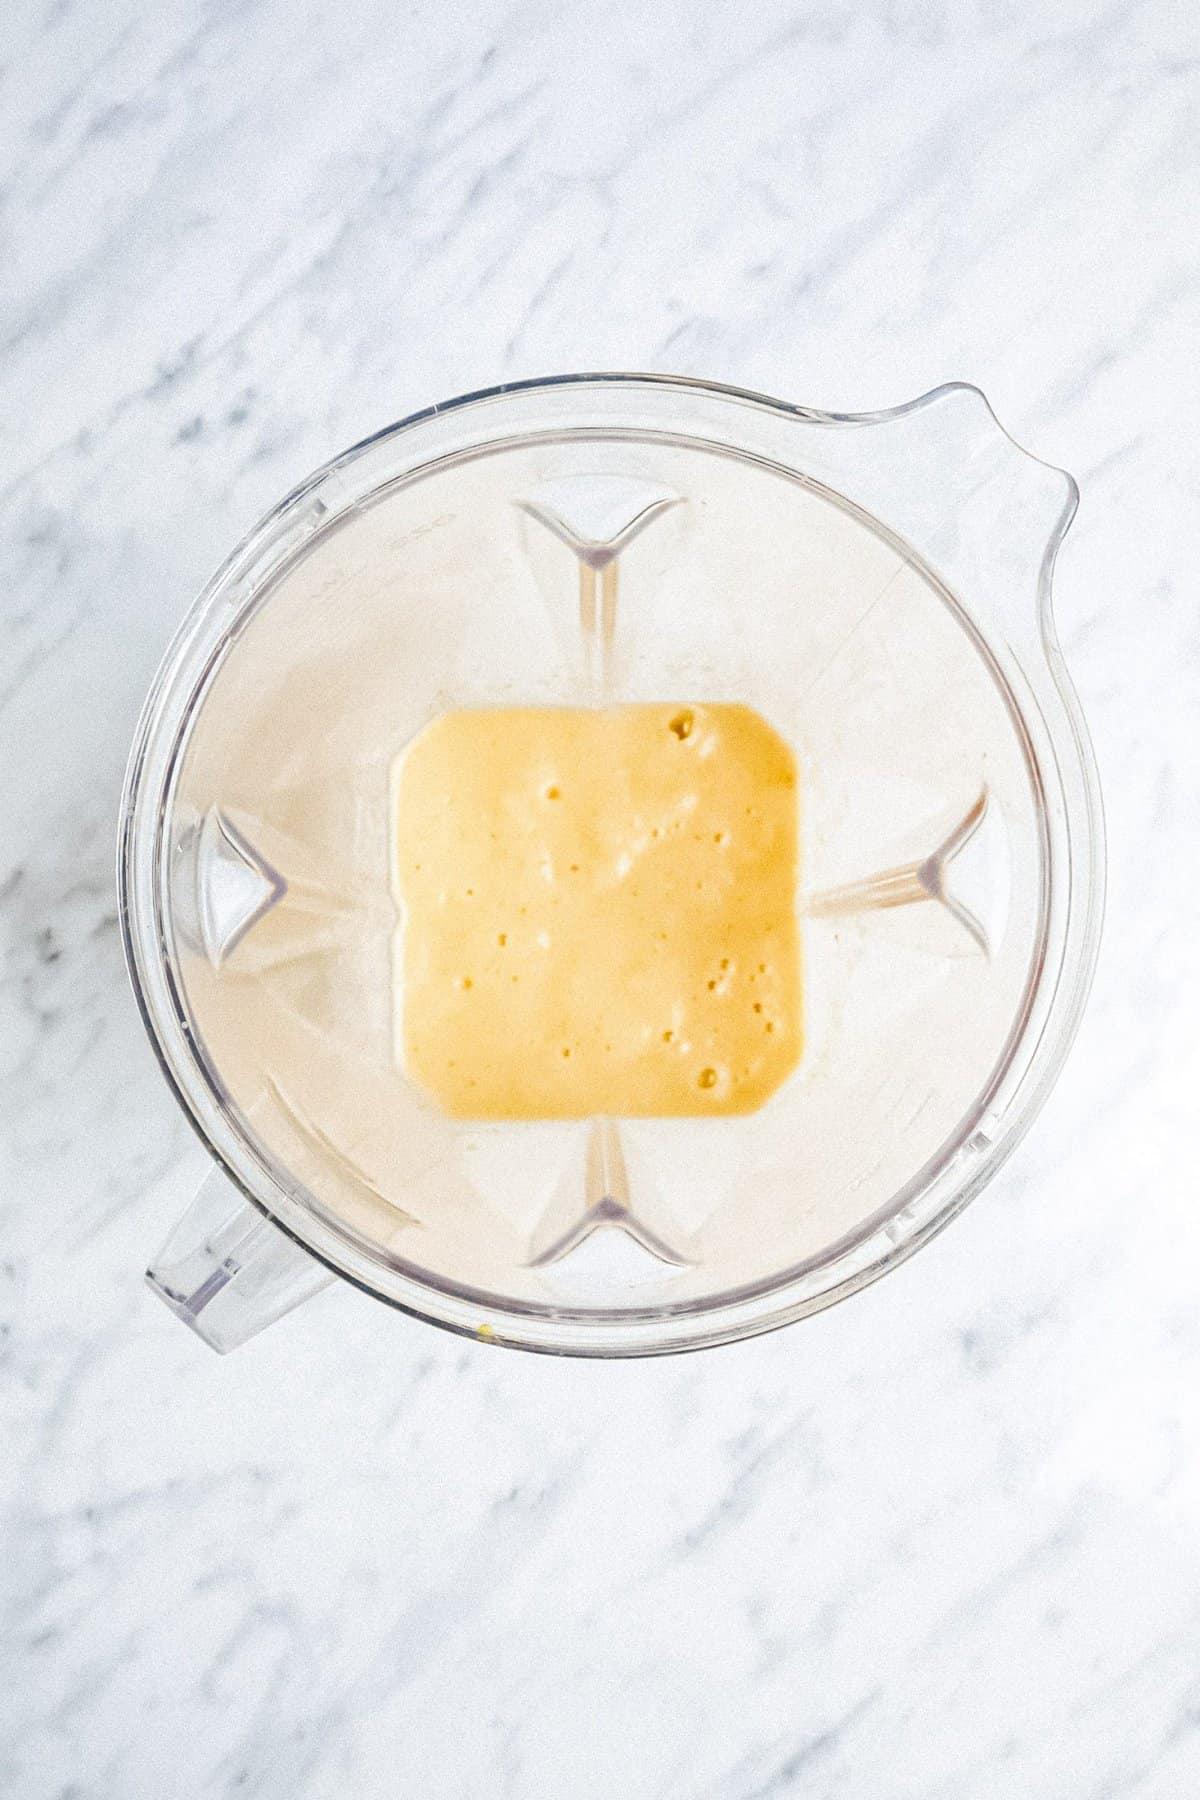 Vegan Orange Creamsicle Smoothie